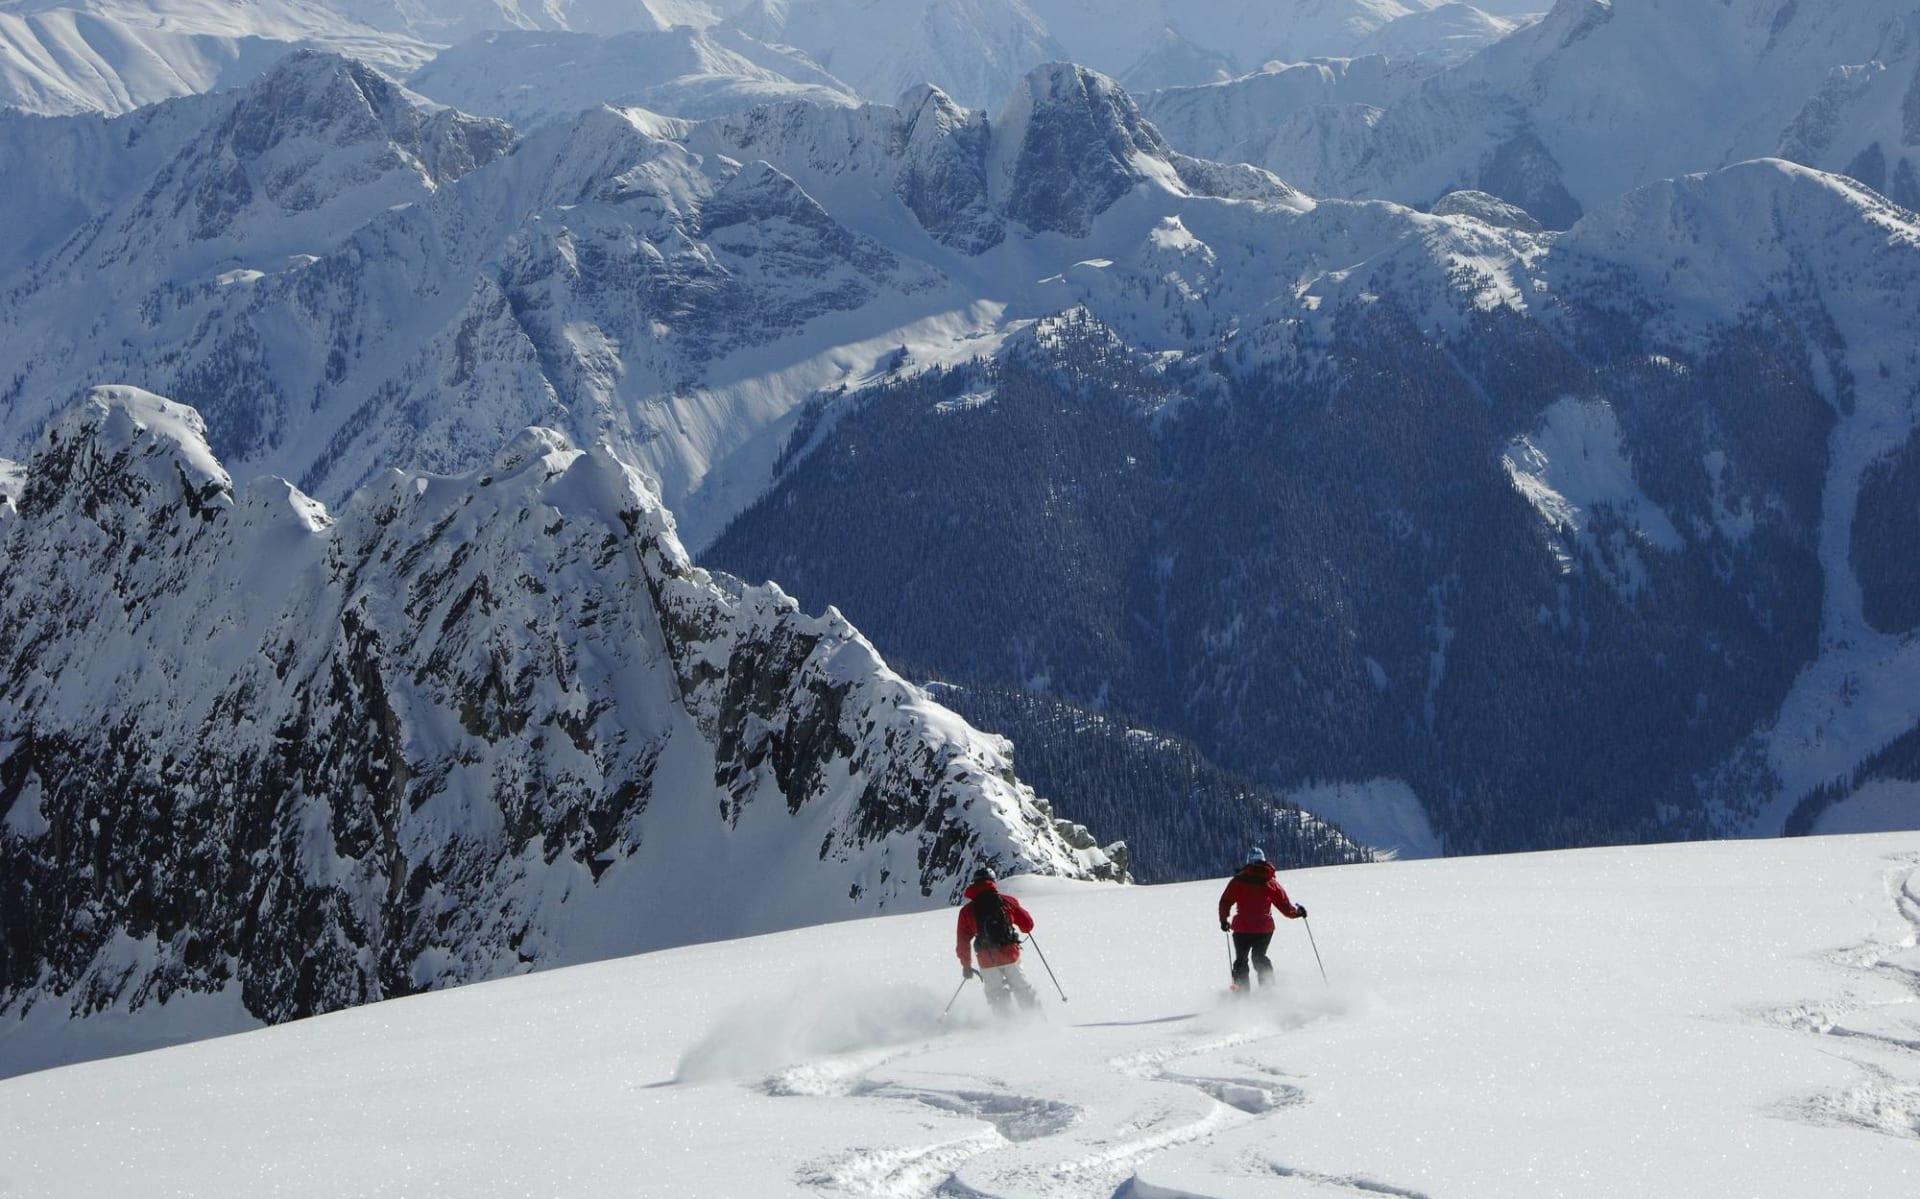 Galena 7 Tage (CMH) ab Kelowna: Kanada - CMH - Galena - zwei Skifahrer